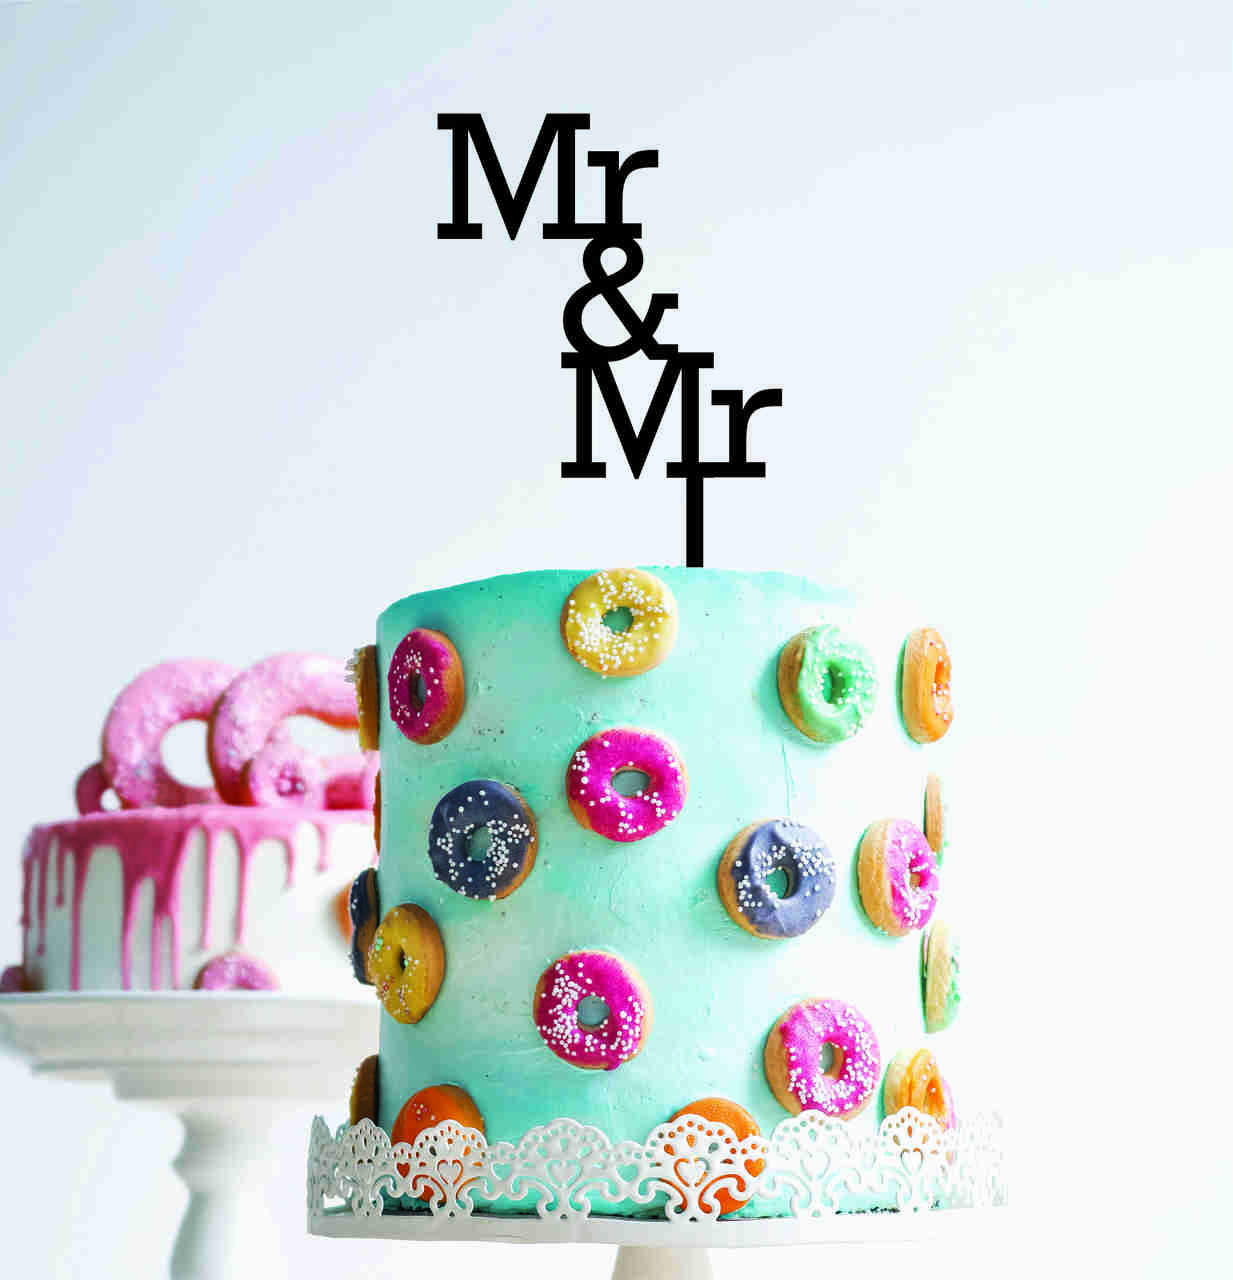 Mr & Mr - Wedding - Wood Cake Topper / wooden topper